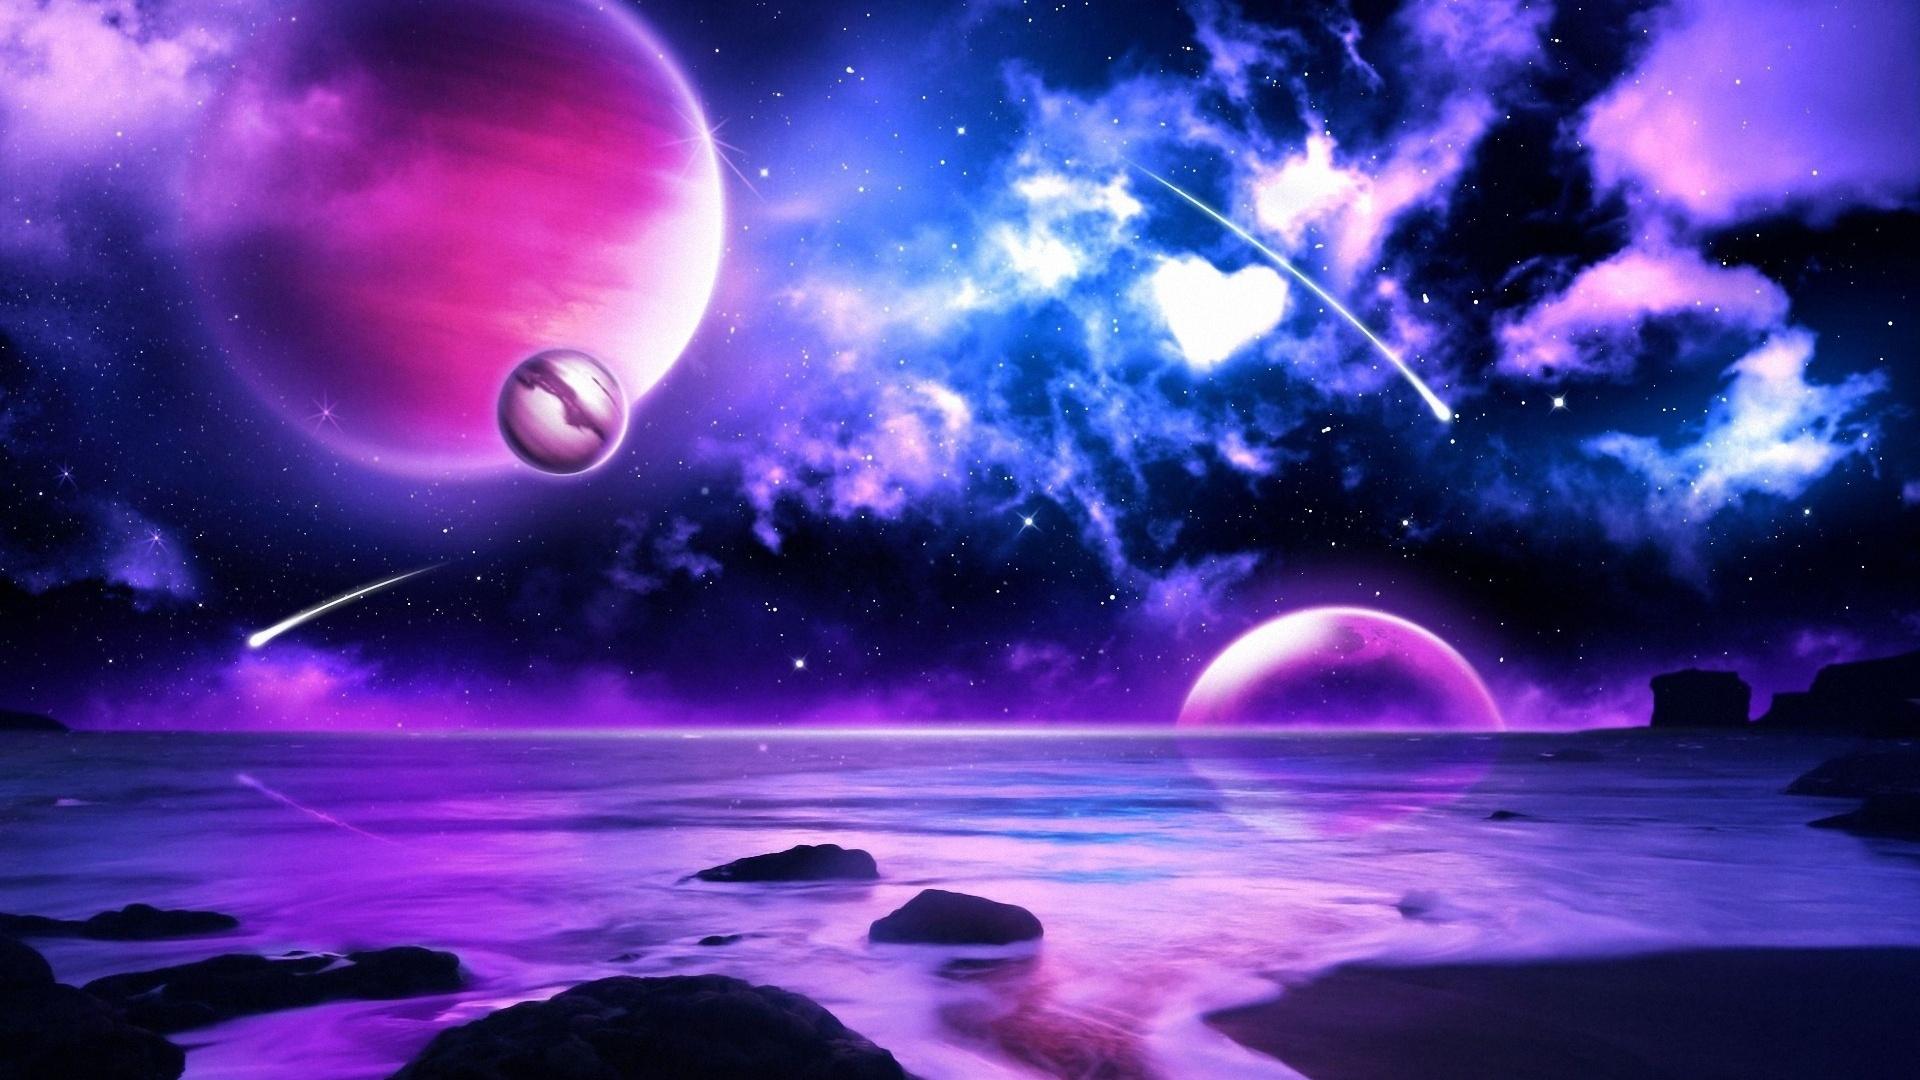 Galaxy Space Live Wallpapers Hd By Narendra Doriya: Espace Pourpre Fond D'écran HD